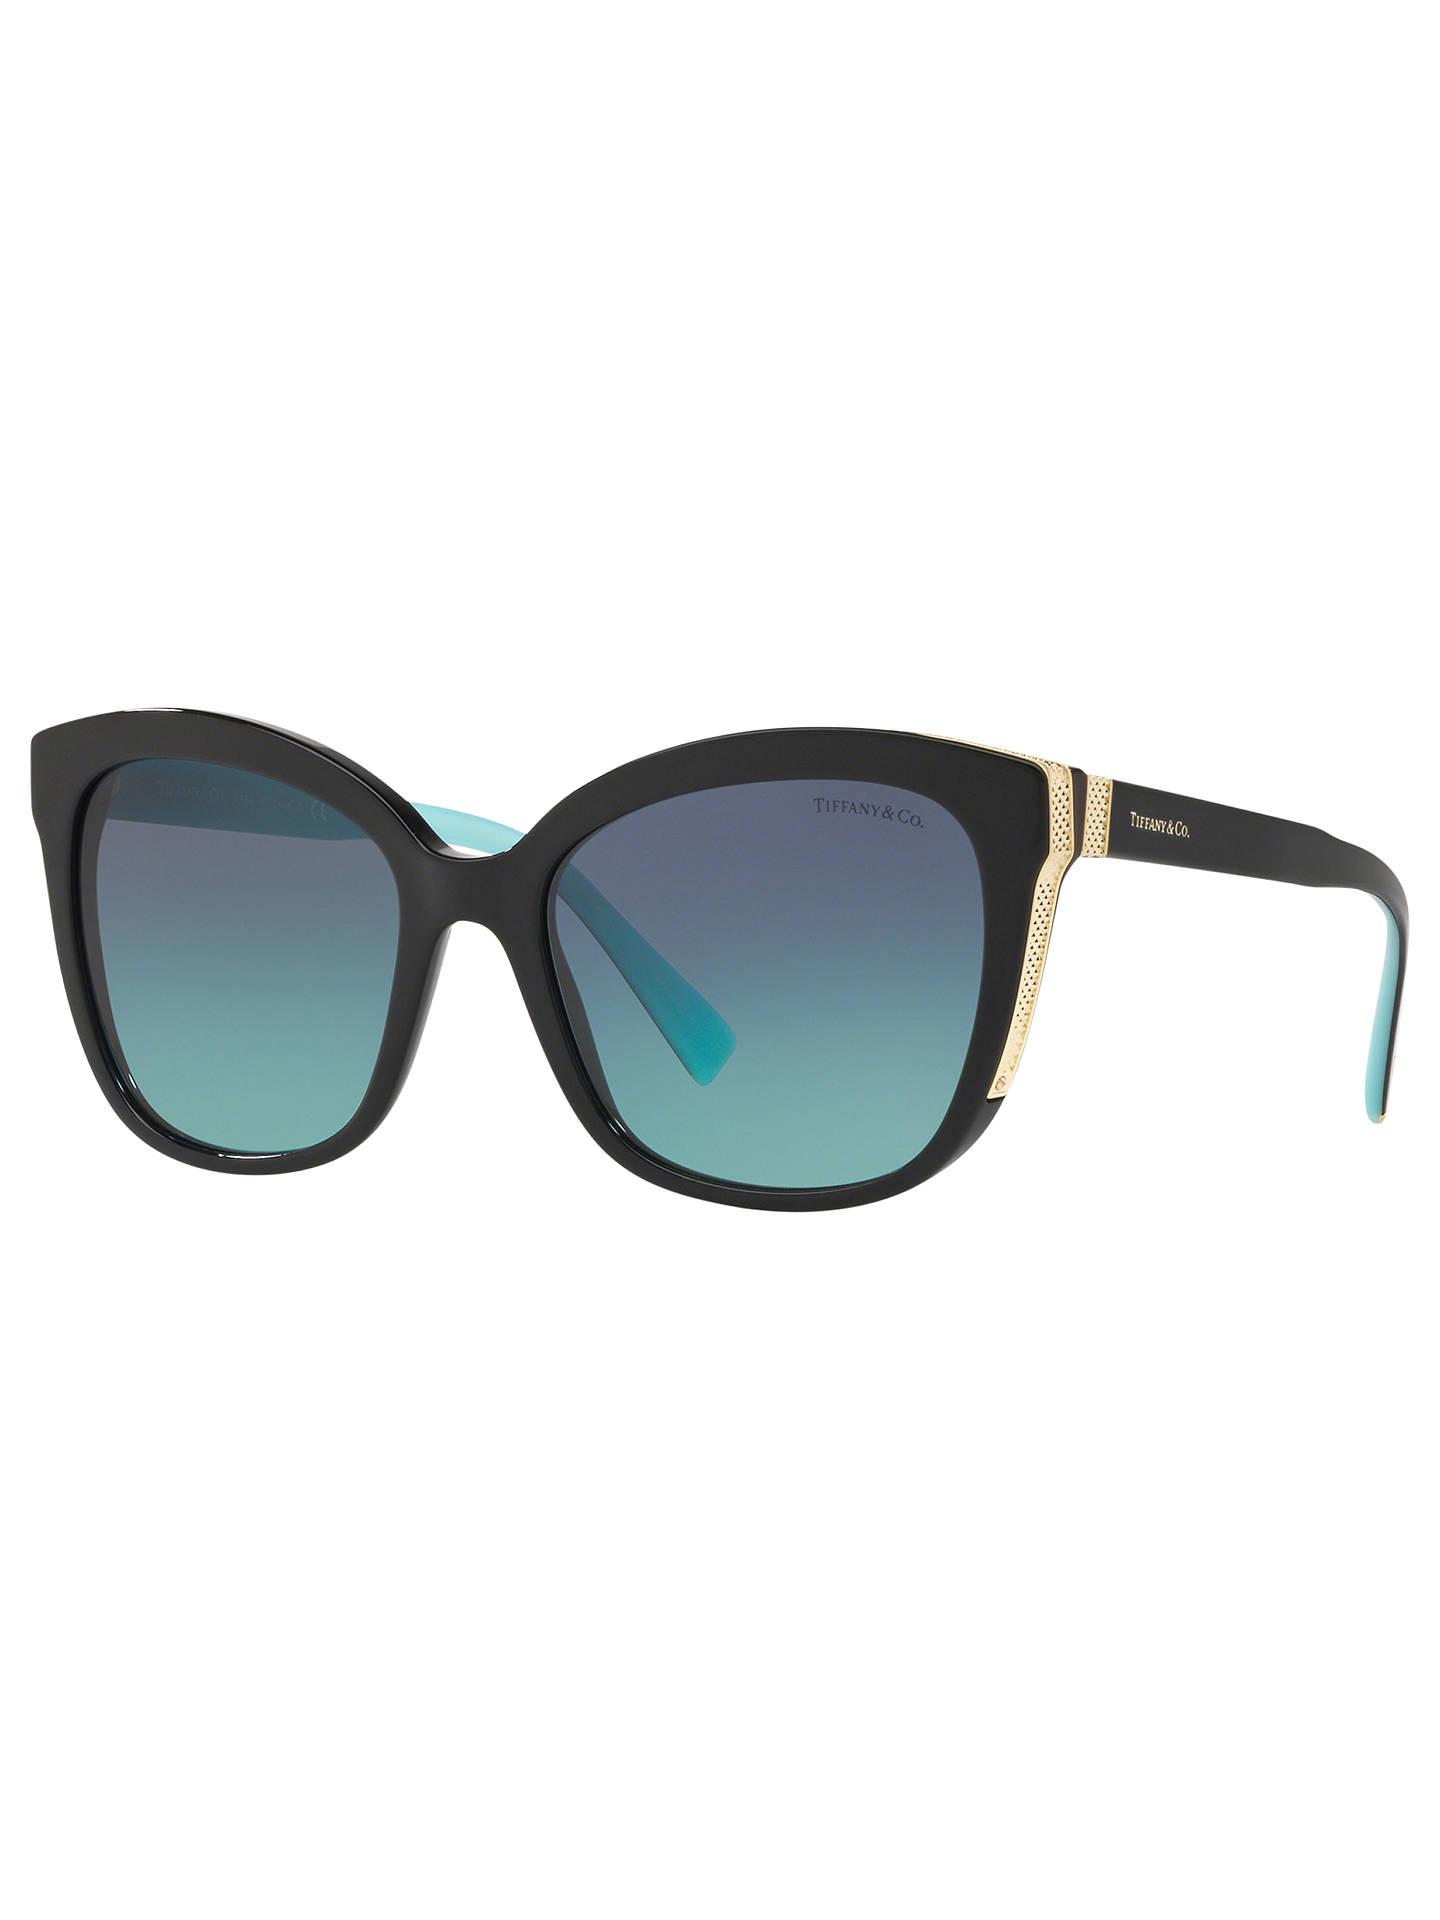 6e5406d35d Buy Tiffany   Co TF4150 Women s Embellished Square Sunglasses